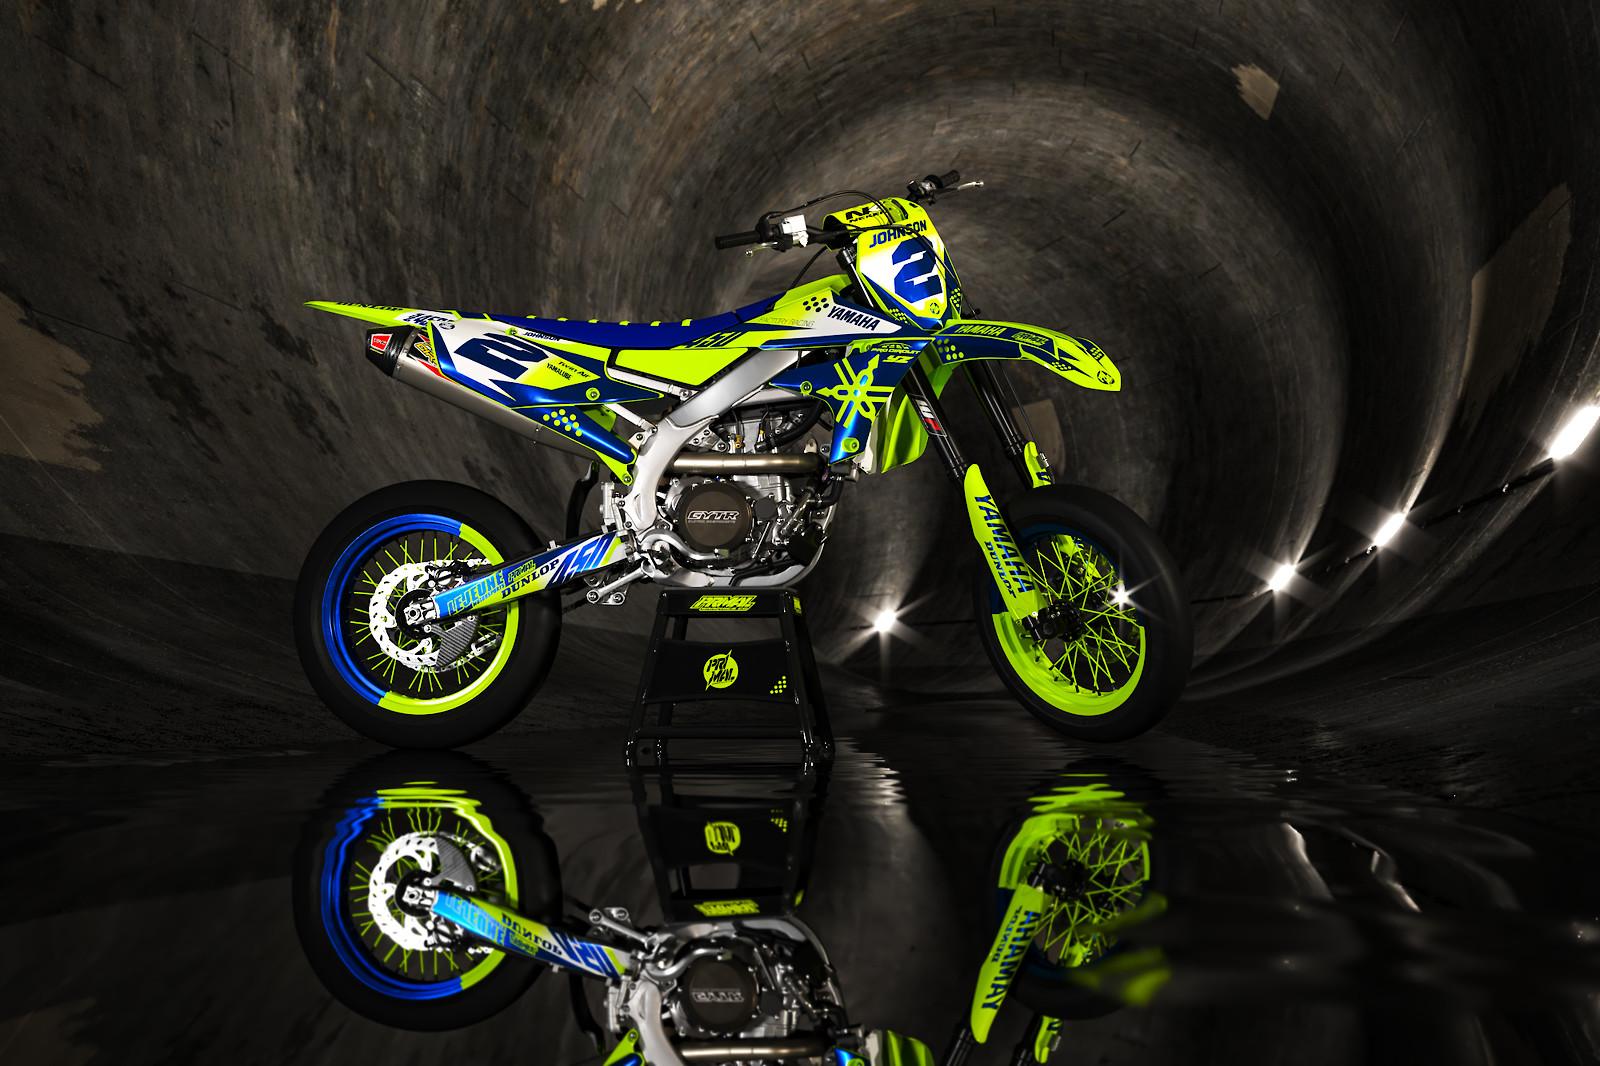 PRIMAL X MOTORSPORTS - YZ450F 2019 YAMAHA MX GRAPHICS MOTOCROSS GRAPHICS - PRIMAL_X_MOTORSPORTS - Motocross Pictures - Vital MX